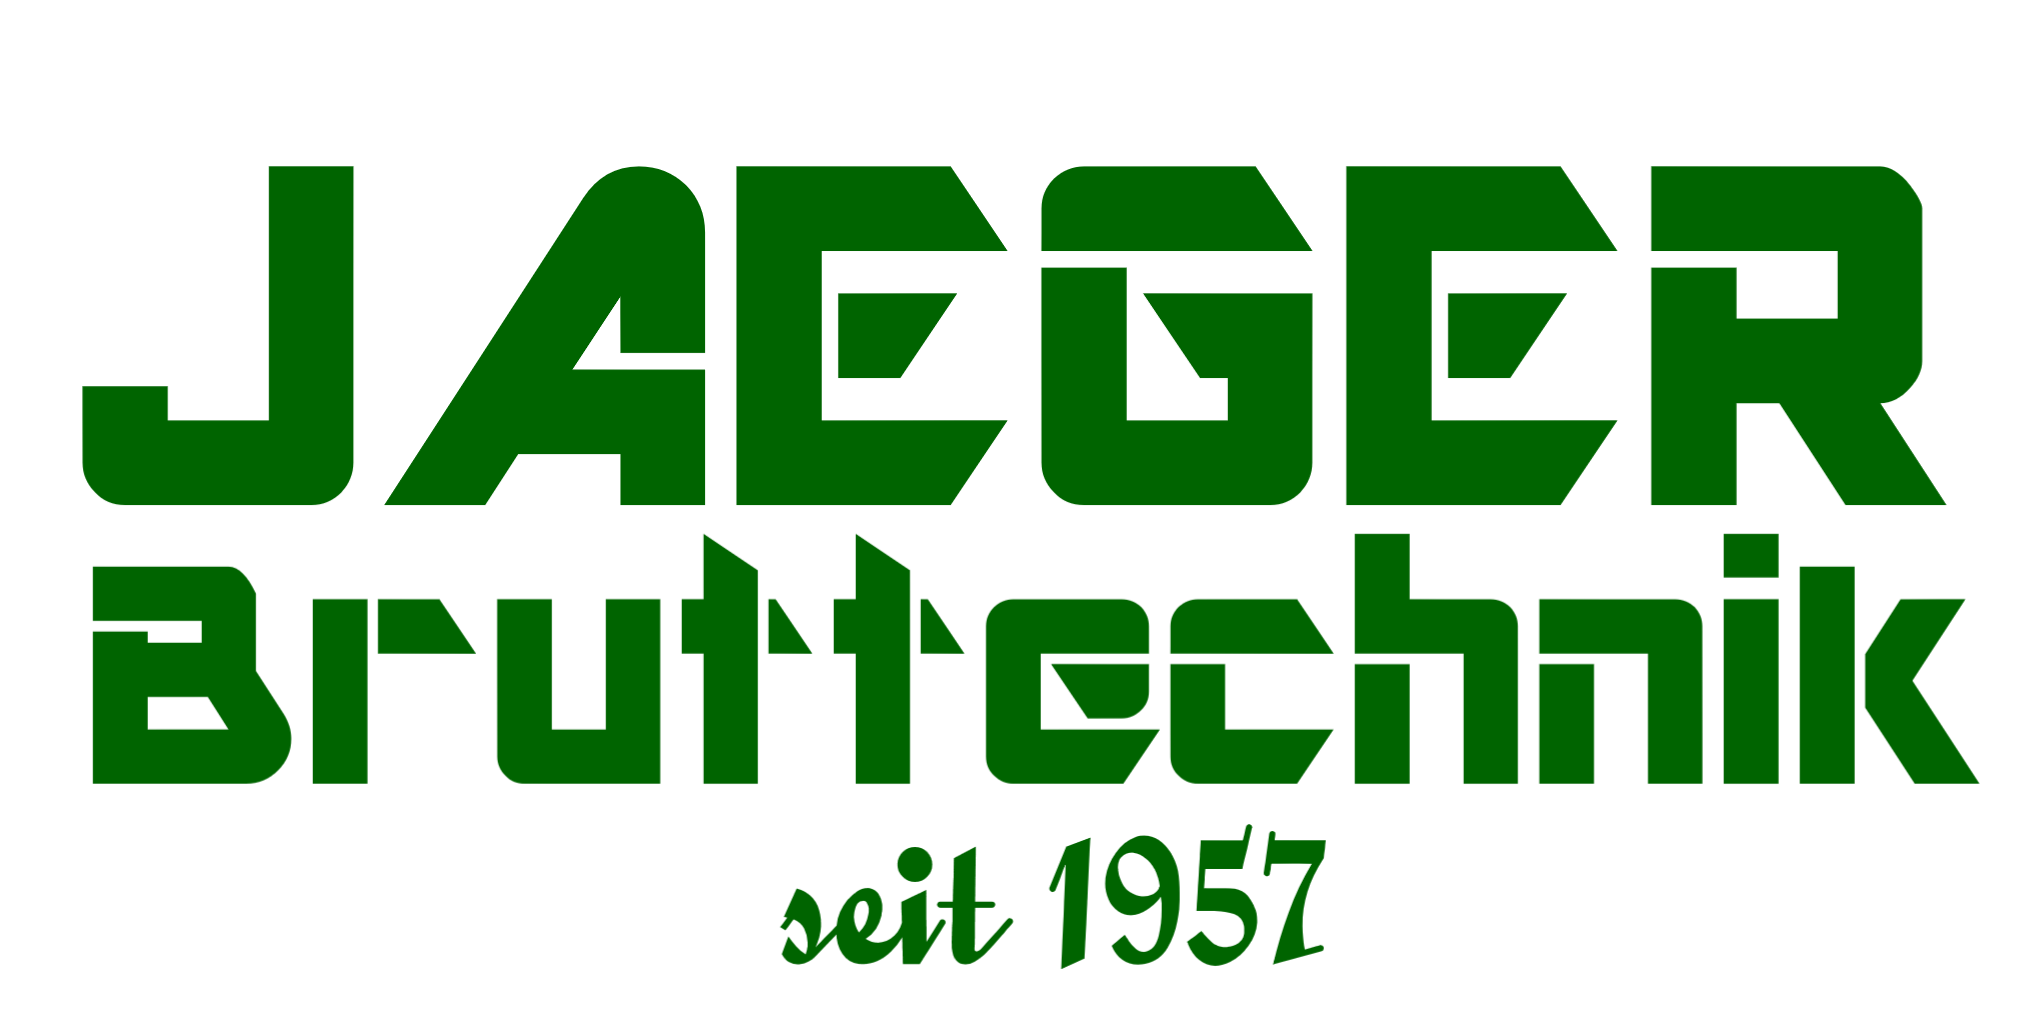 Jäger Bruttechnik